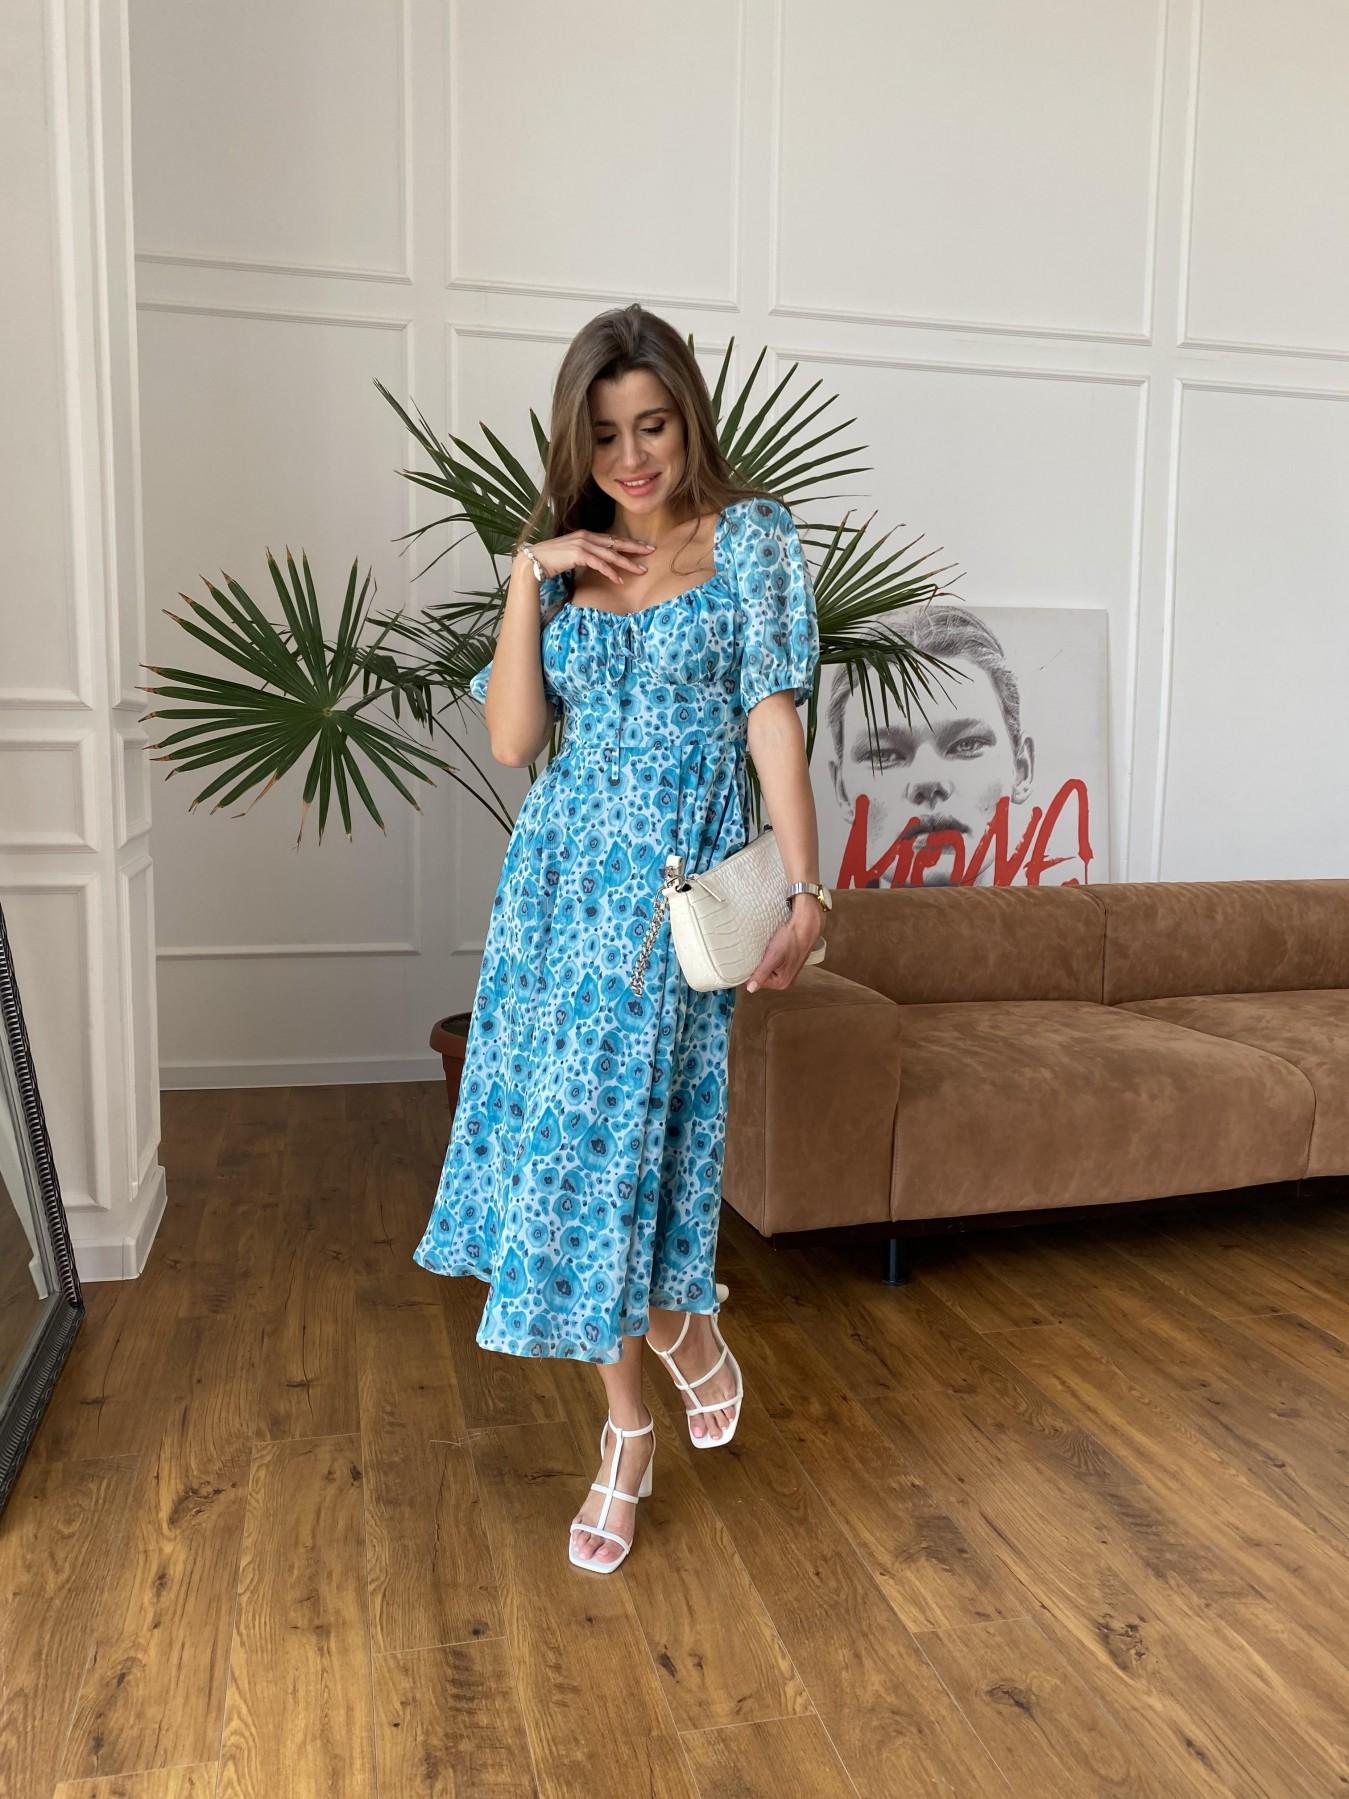 Кисес Миди платье из креп шифона в принт 11575 АРТ. 48269 Цвет: Маки/ Бирюза - фото 1, интернет магазин tm-modus.ru